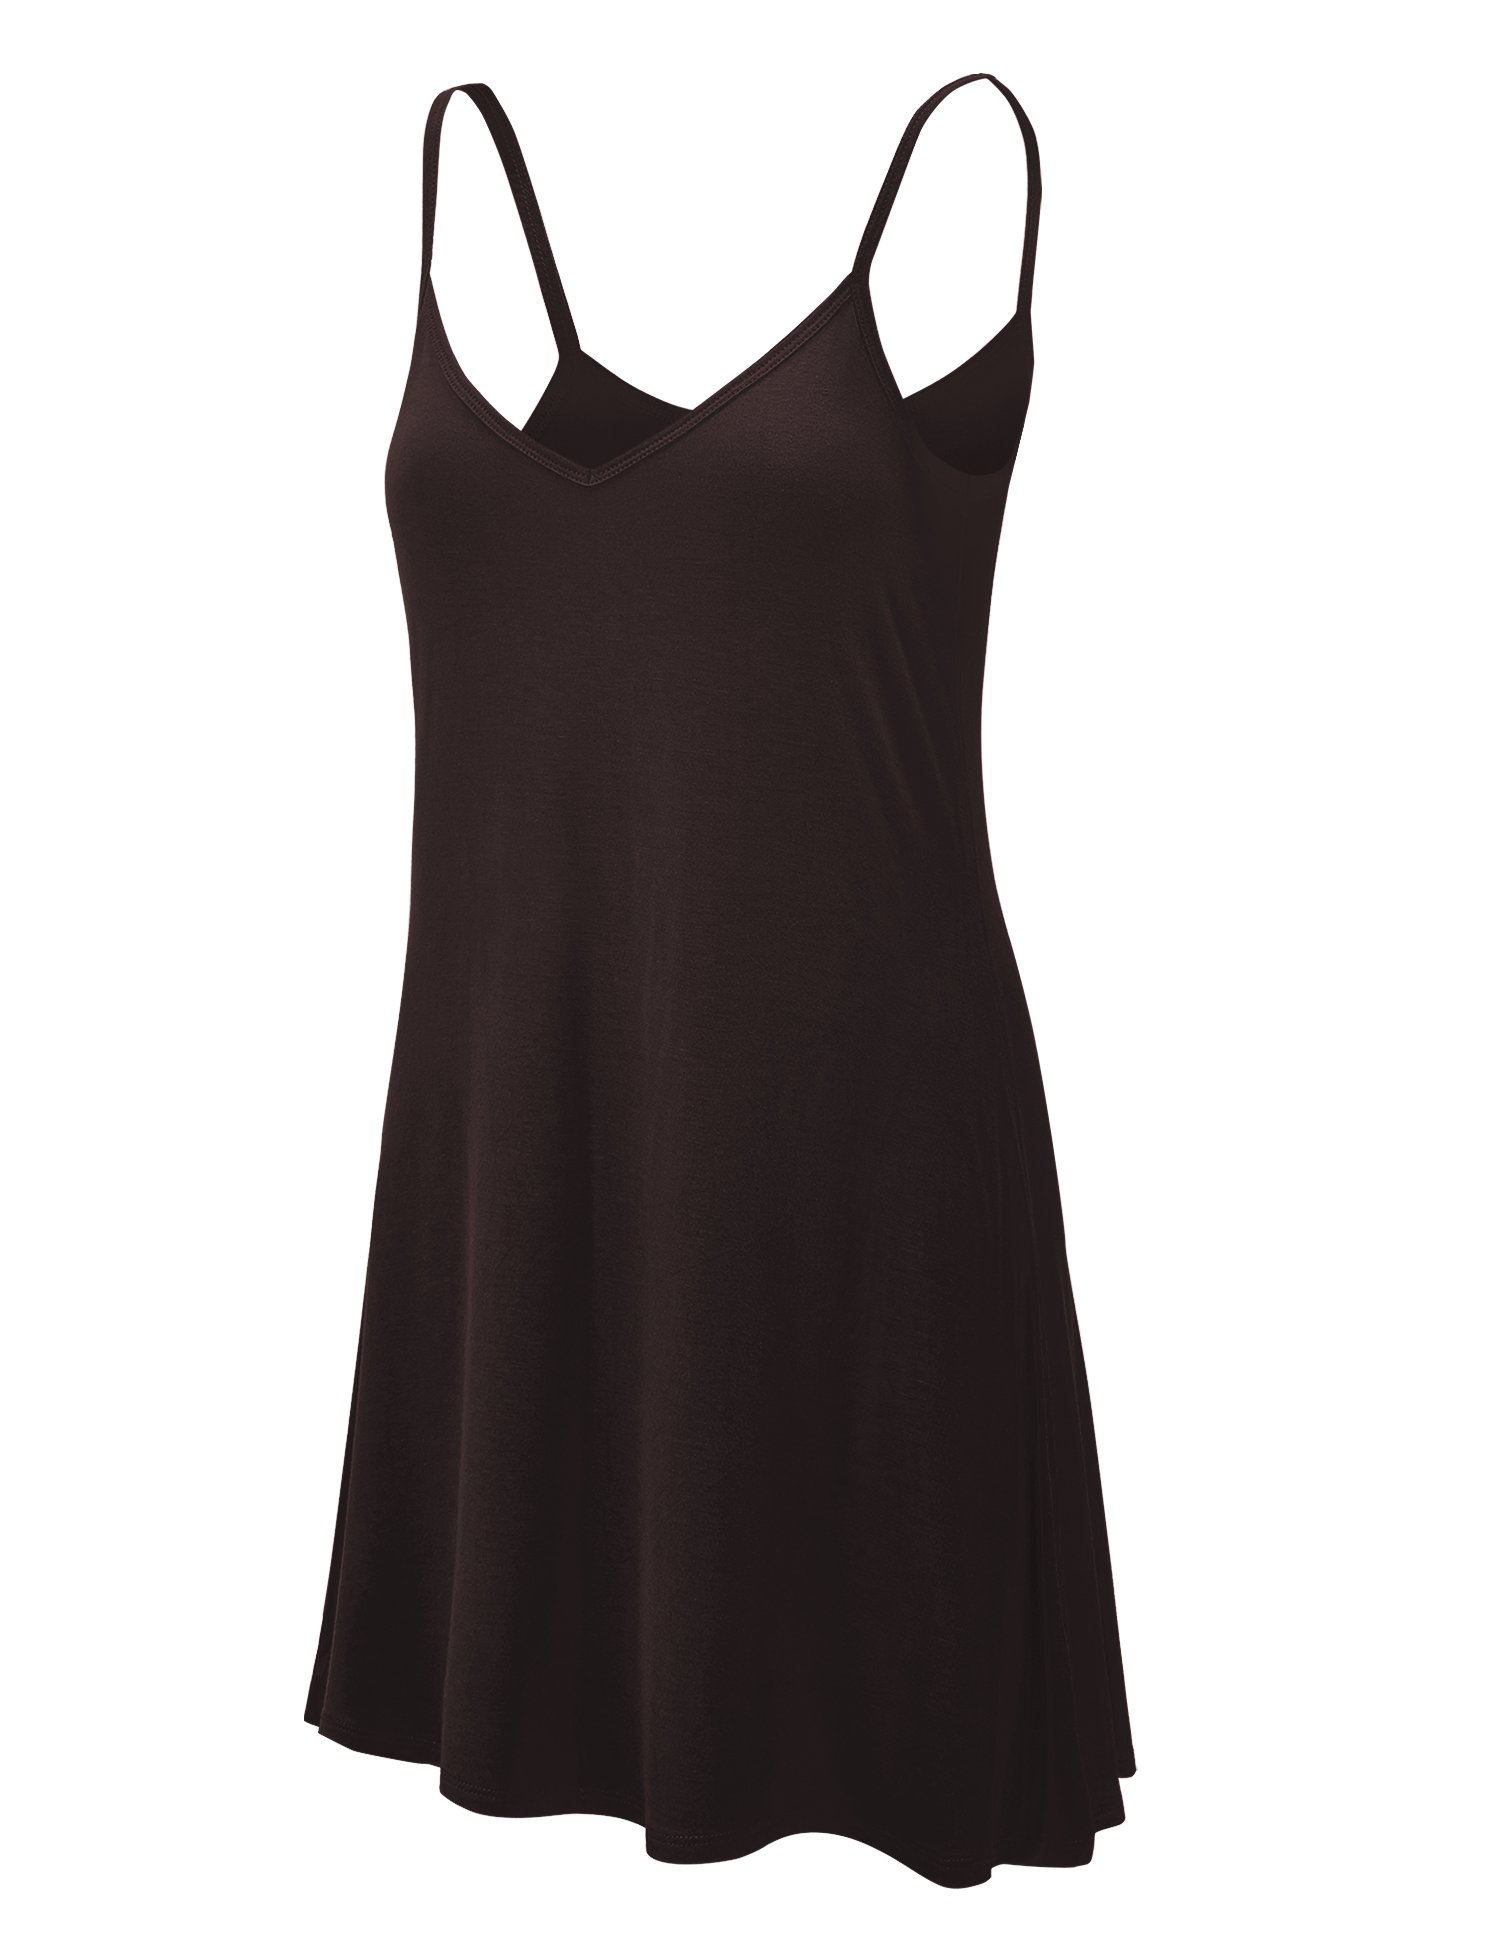 WDR1090 Womens V Neck Spaghetti Strap Tunic Short Dress S Brown